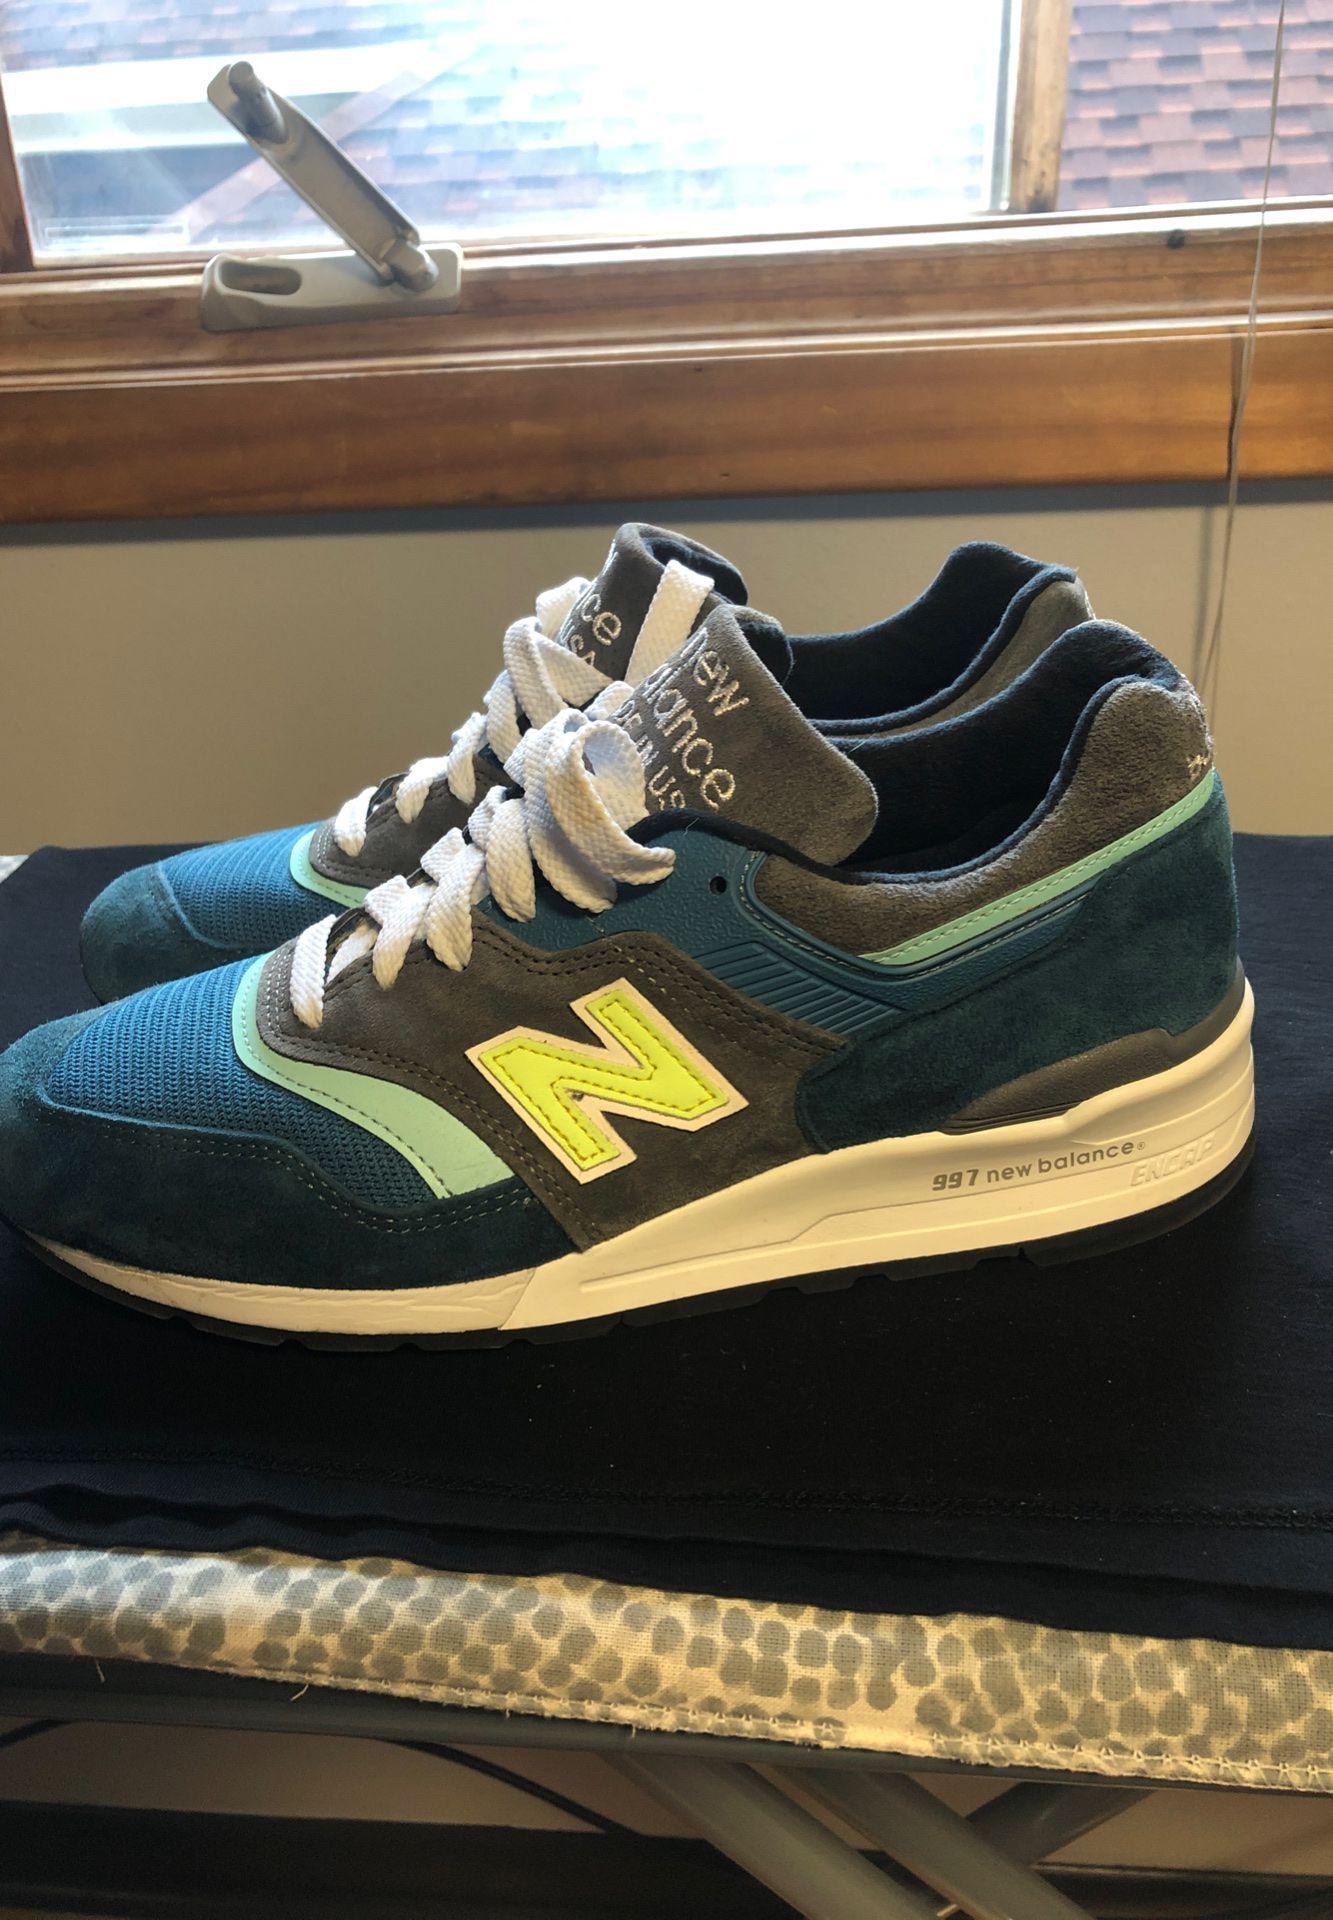 New Balance shoes men size 9 US